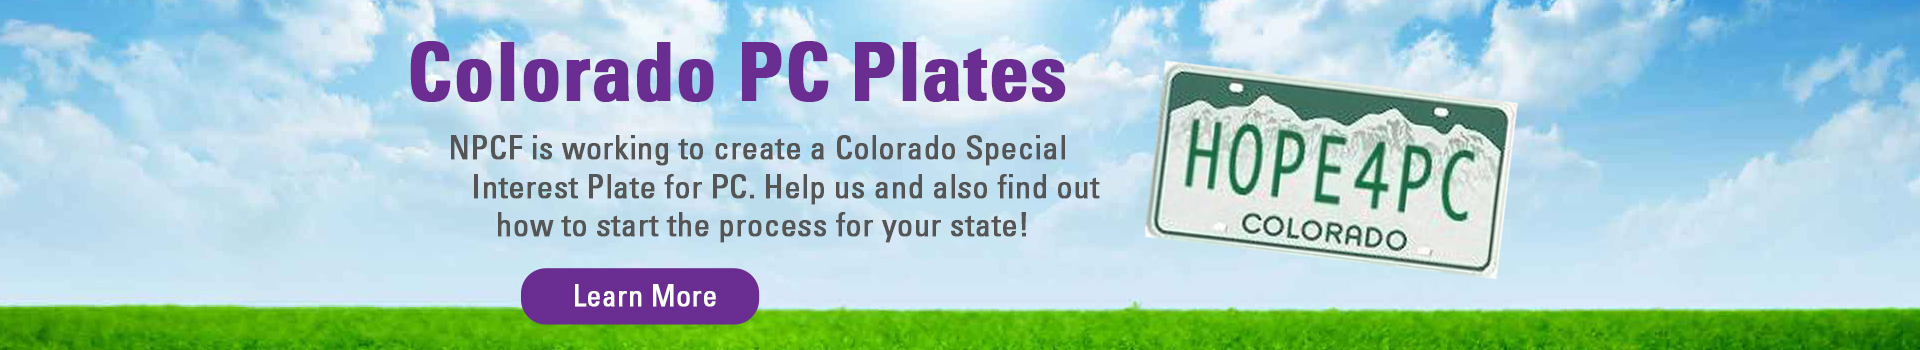 npcf-slider-colorado-license-plate-pc